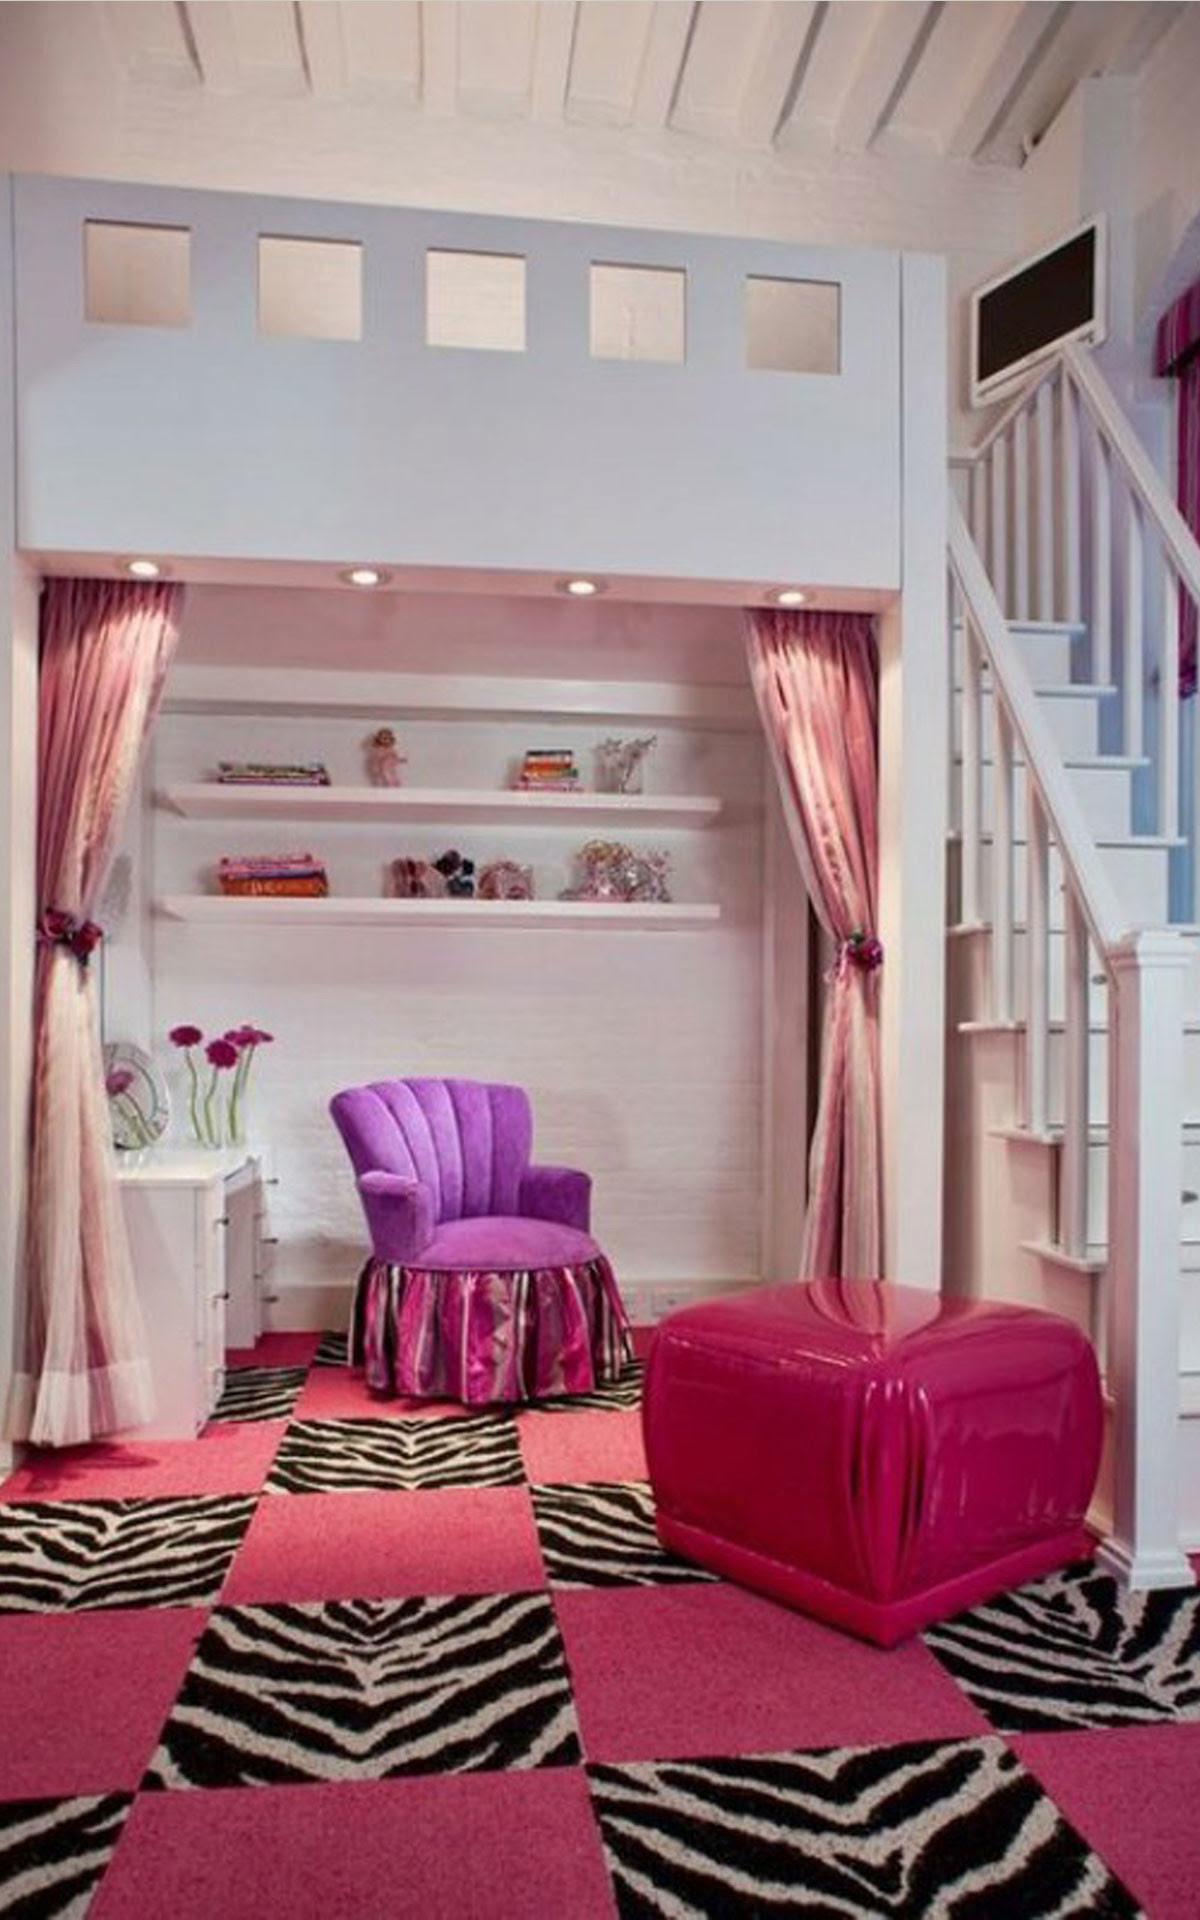 Cool Room Decor For Girls Whaciendobuenasmigas